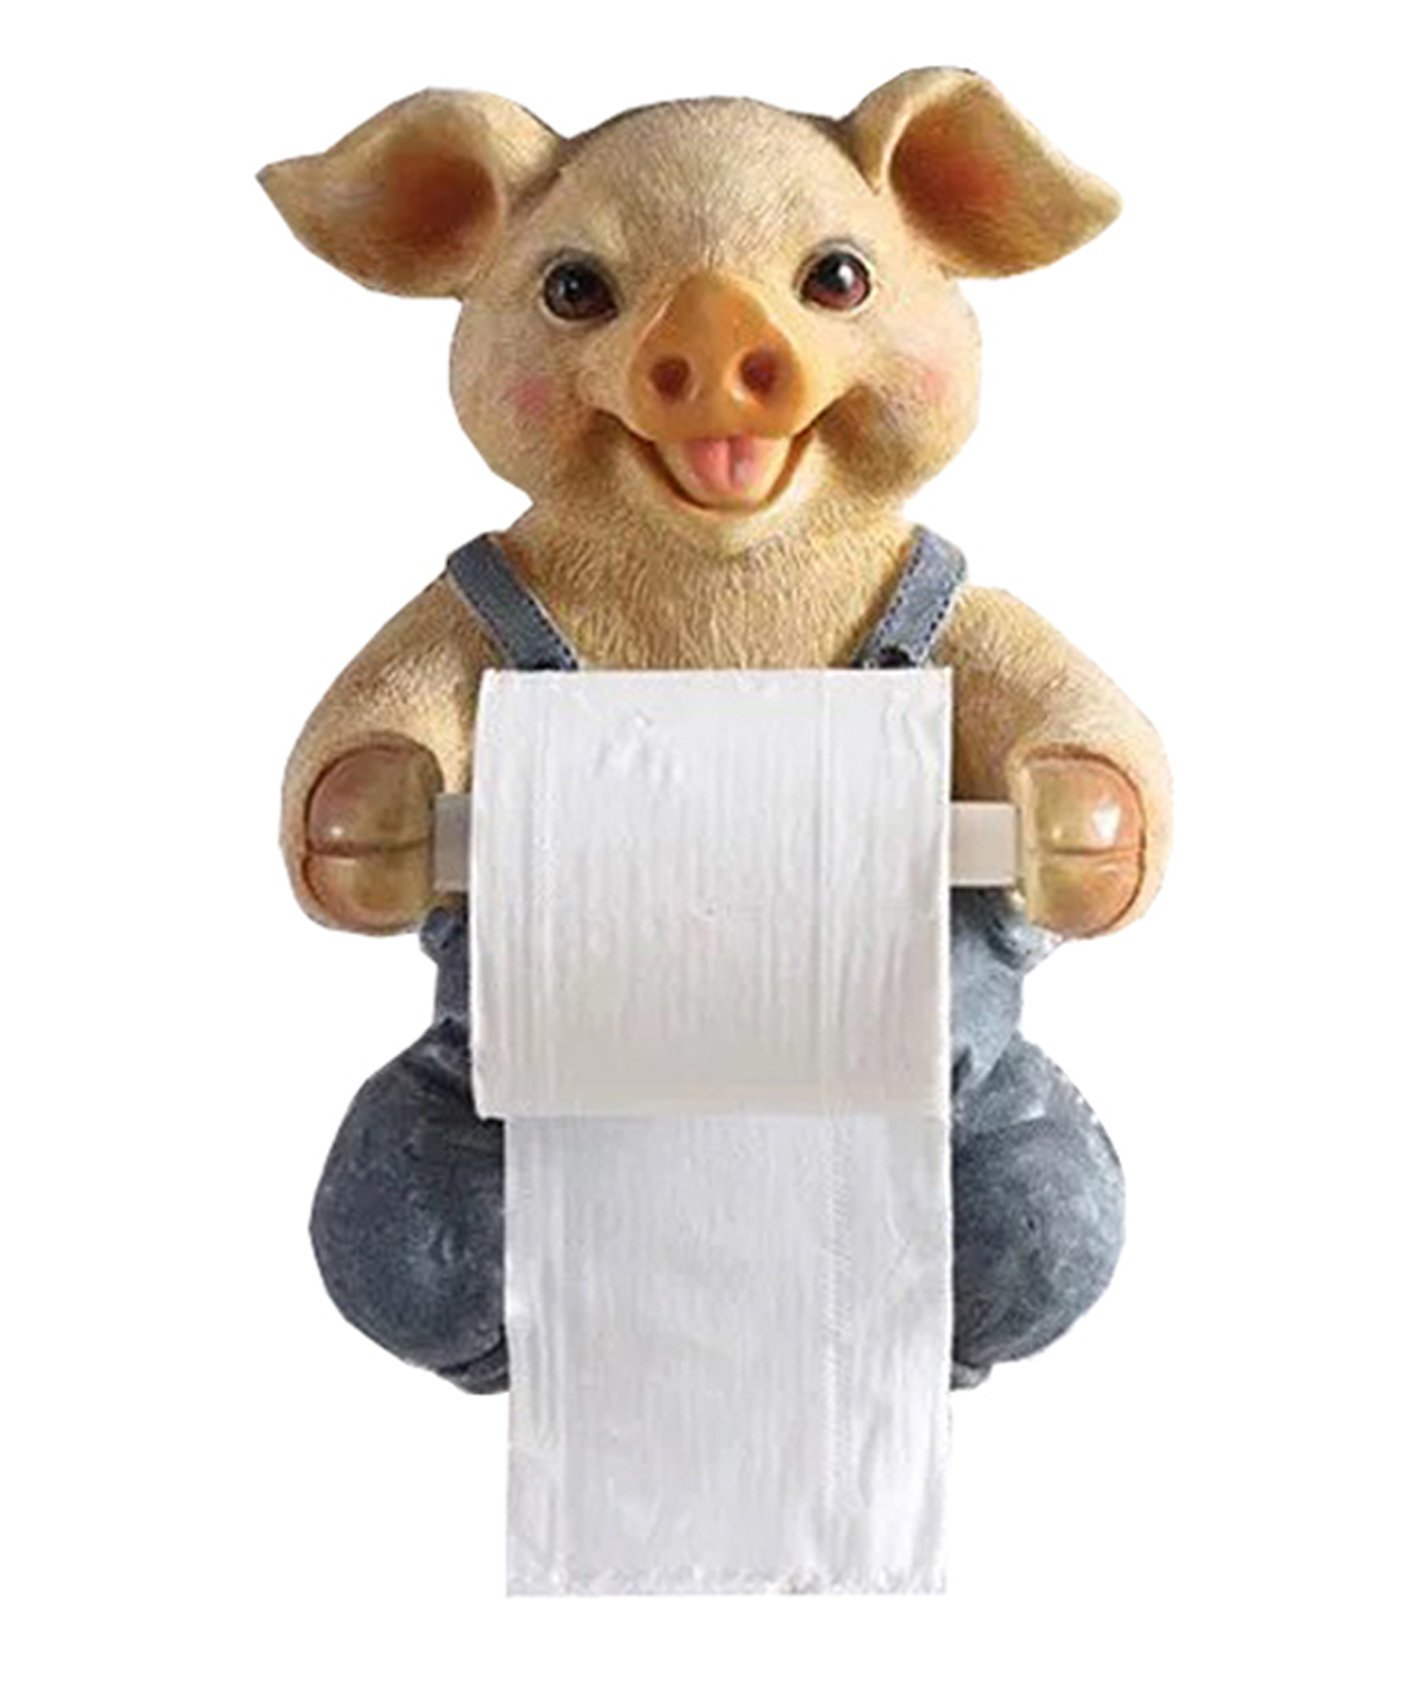 C & S Toilet Paper Holder Dispenser, Tissue Roll Towel Holder Stand, Funny Animal Wall Mount Bathroom Kitchen Home Décor (Pig)